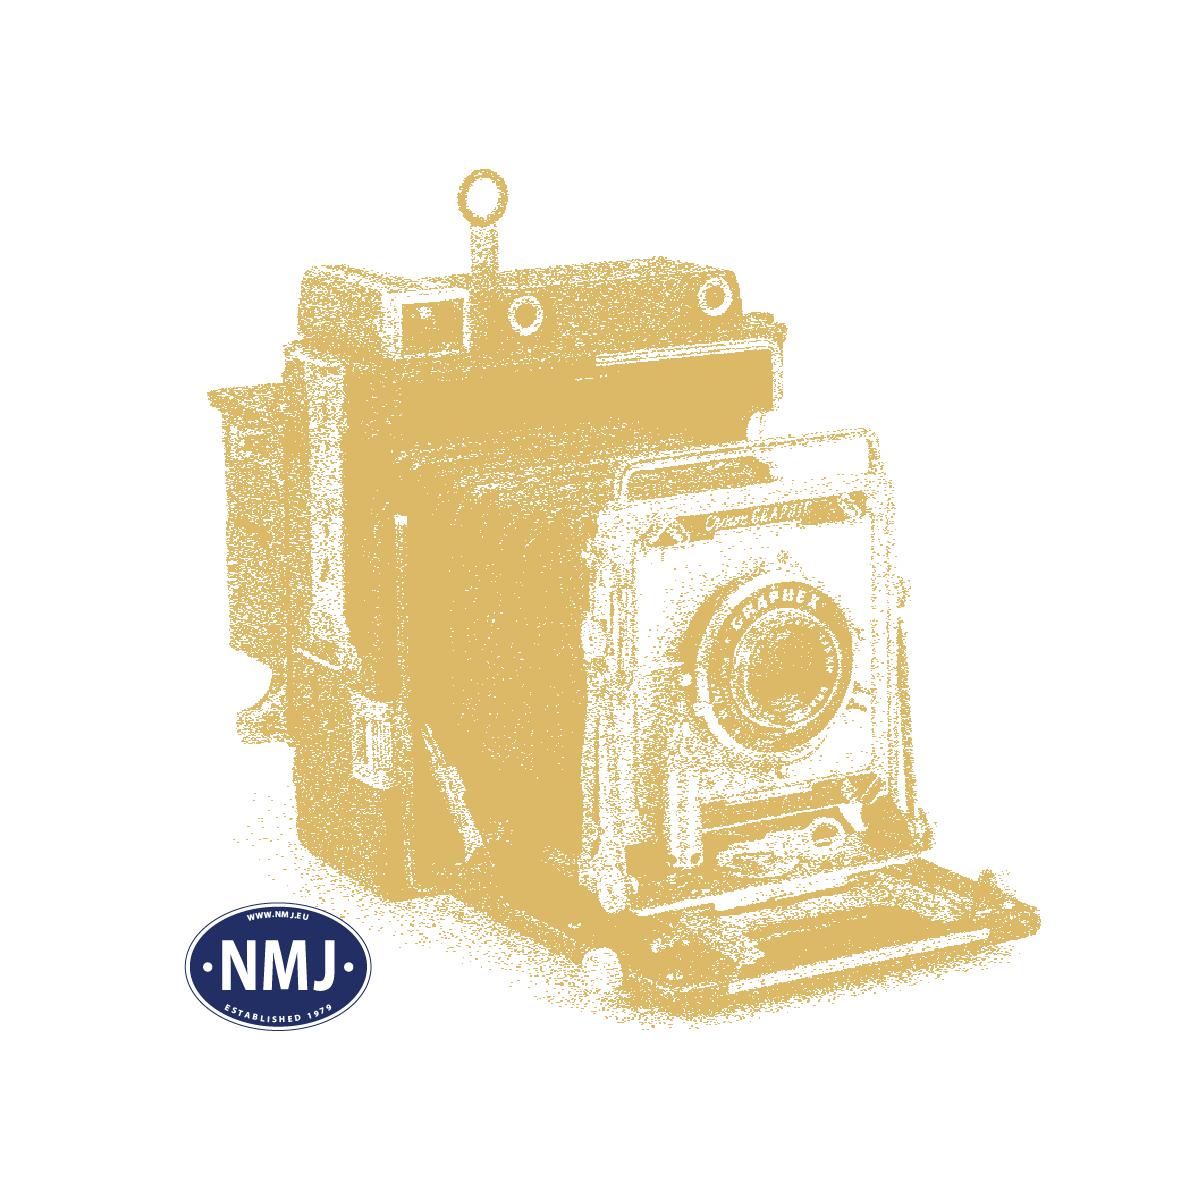 NMJ0.21507 - NMJ Superline Modell des Personen/Gepäckwagens BF10.21507 der NSB, Spur 0